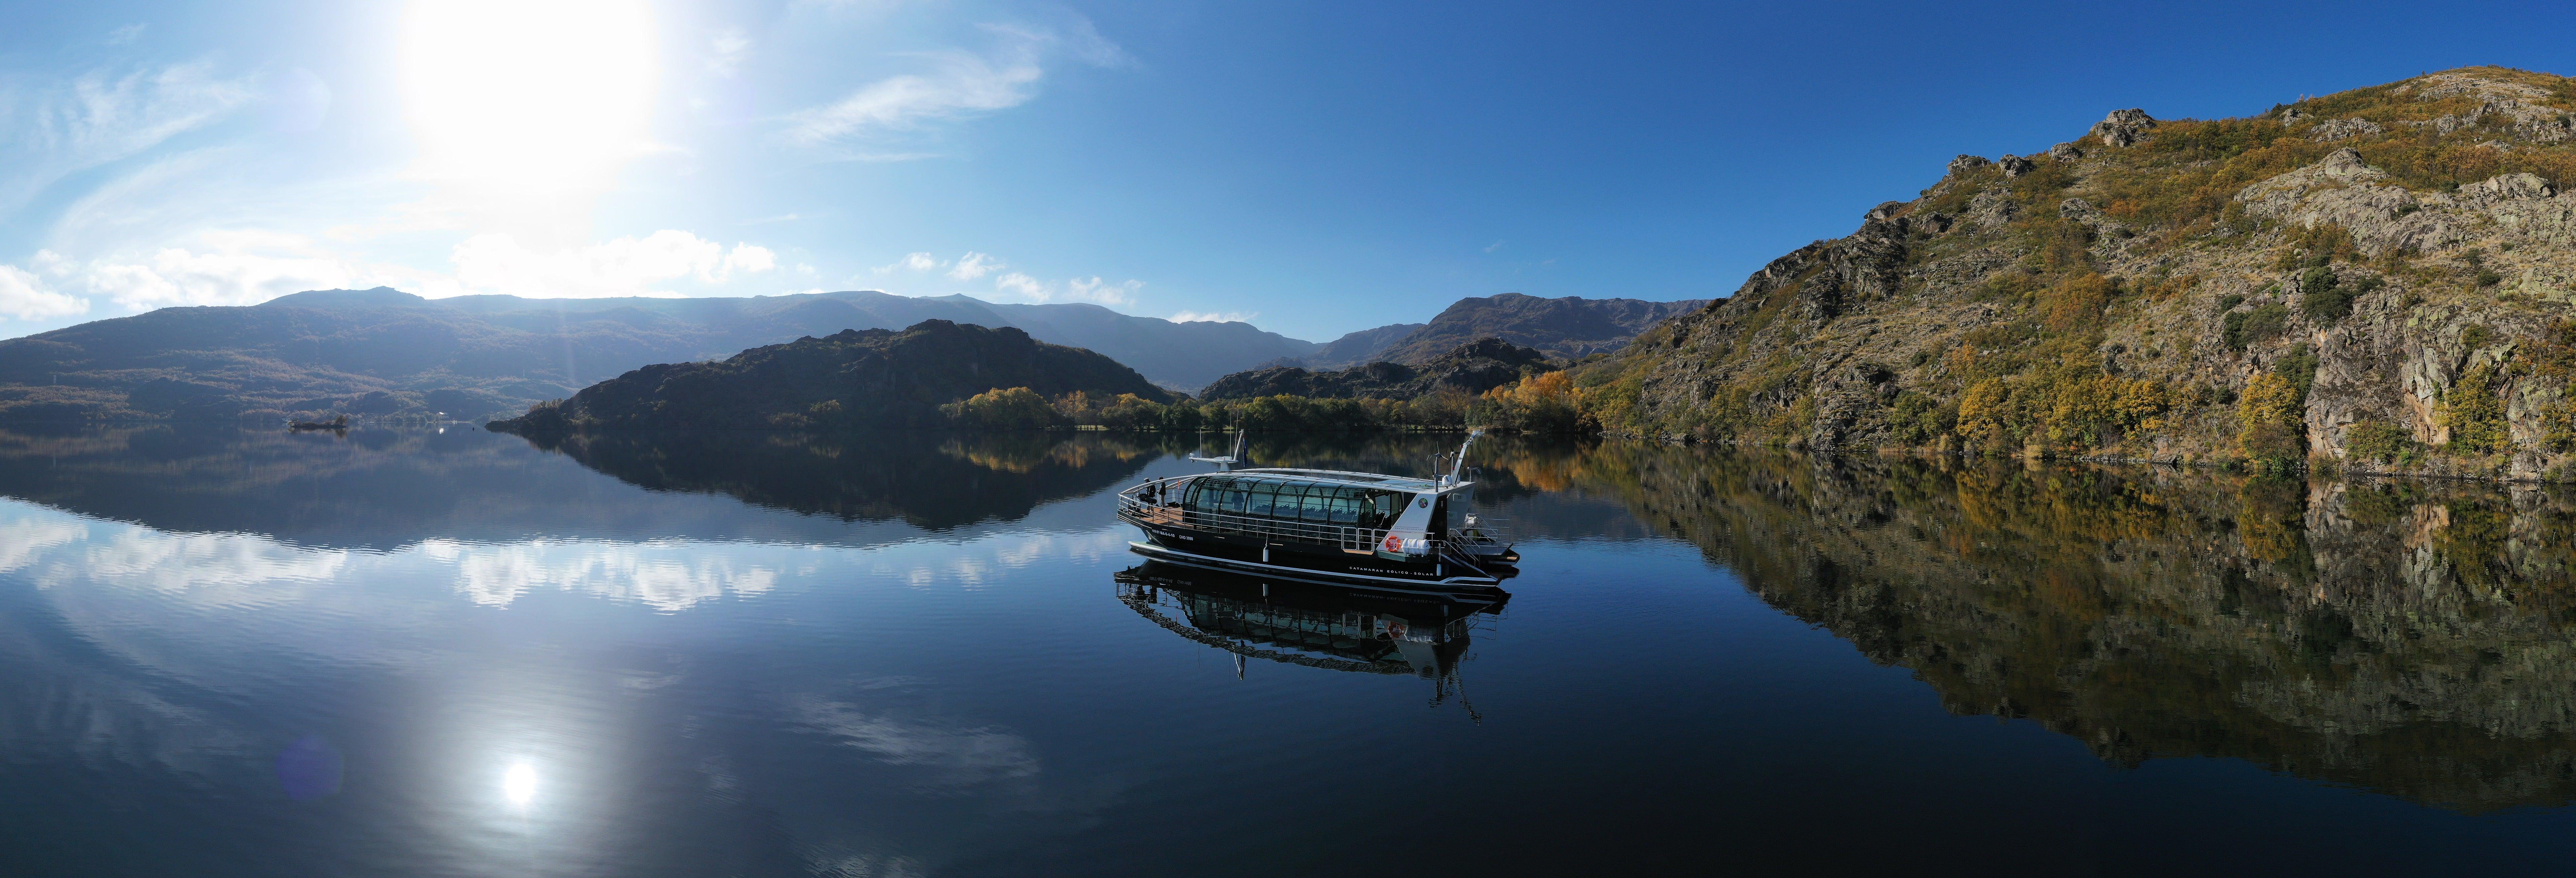 Balade en bateau sur le Lac de Sanabria